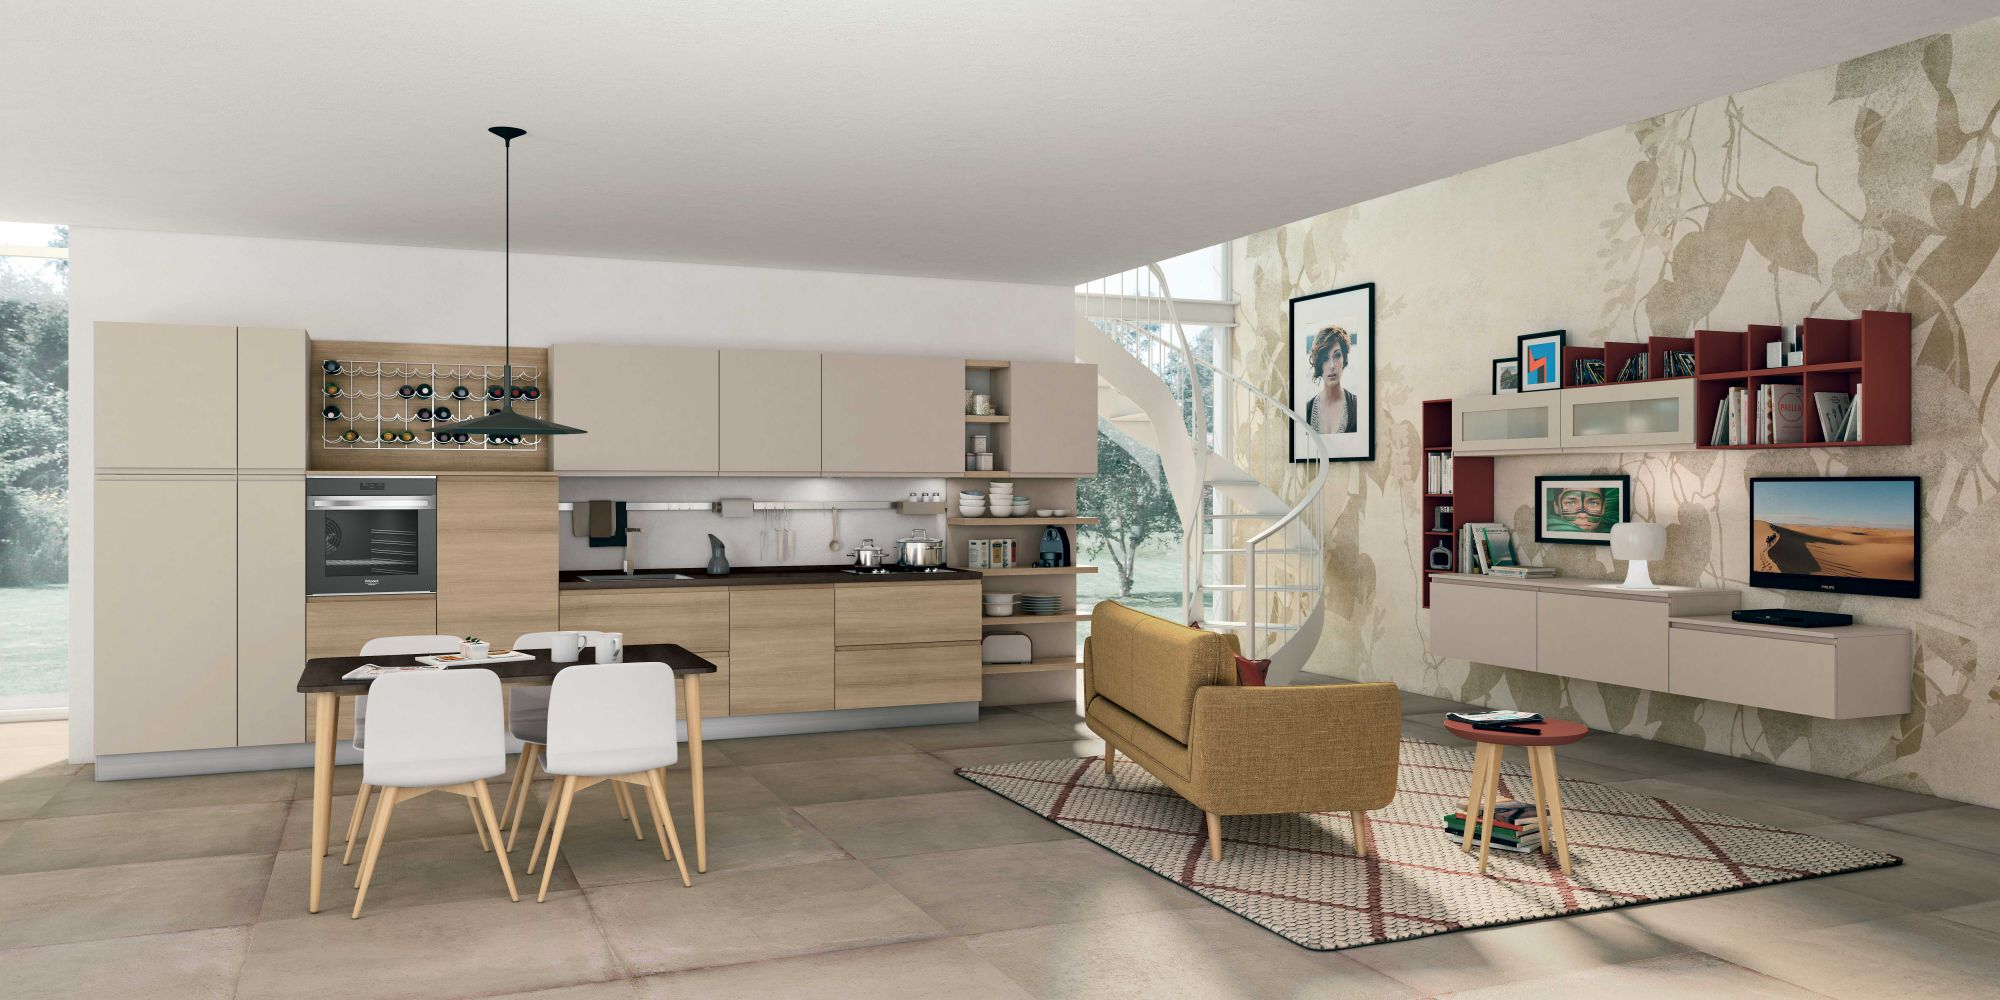 Cucina jey di creo kitchens stile e design essenziale - Living e cucina ...